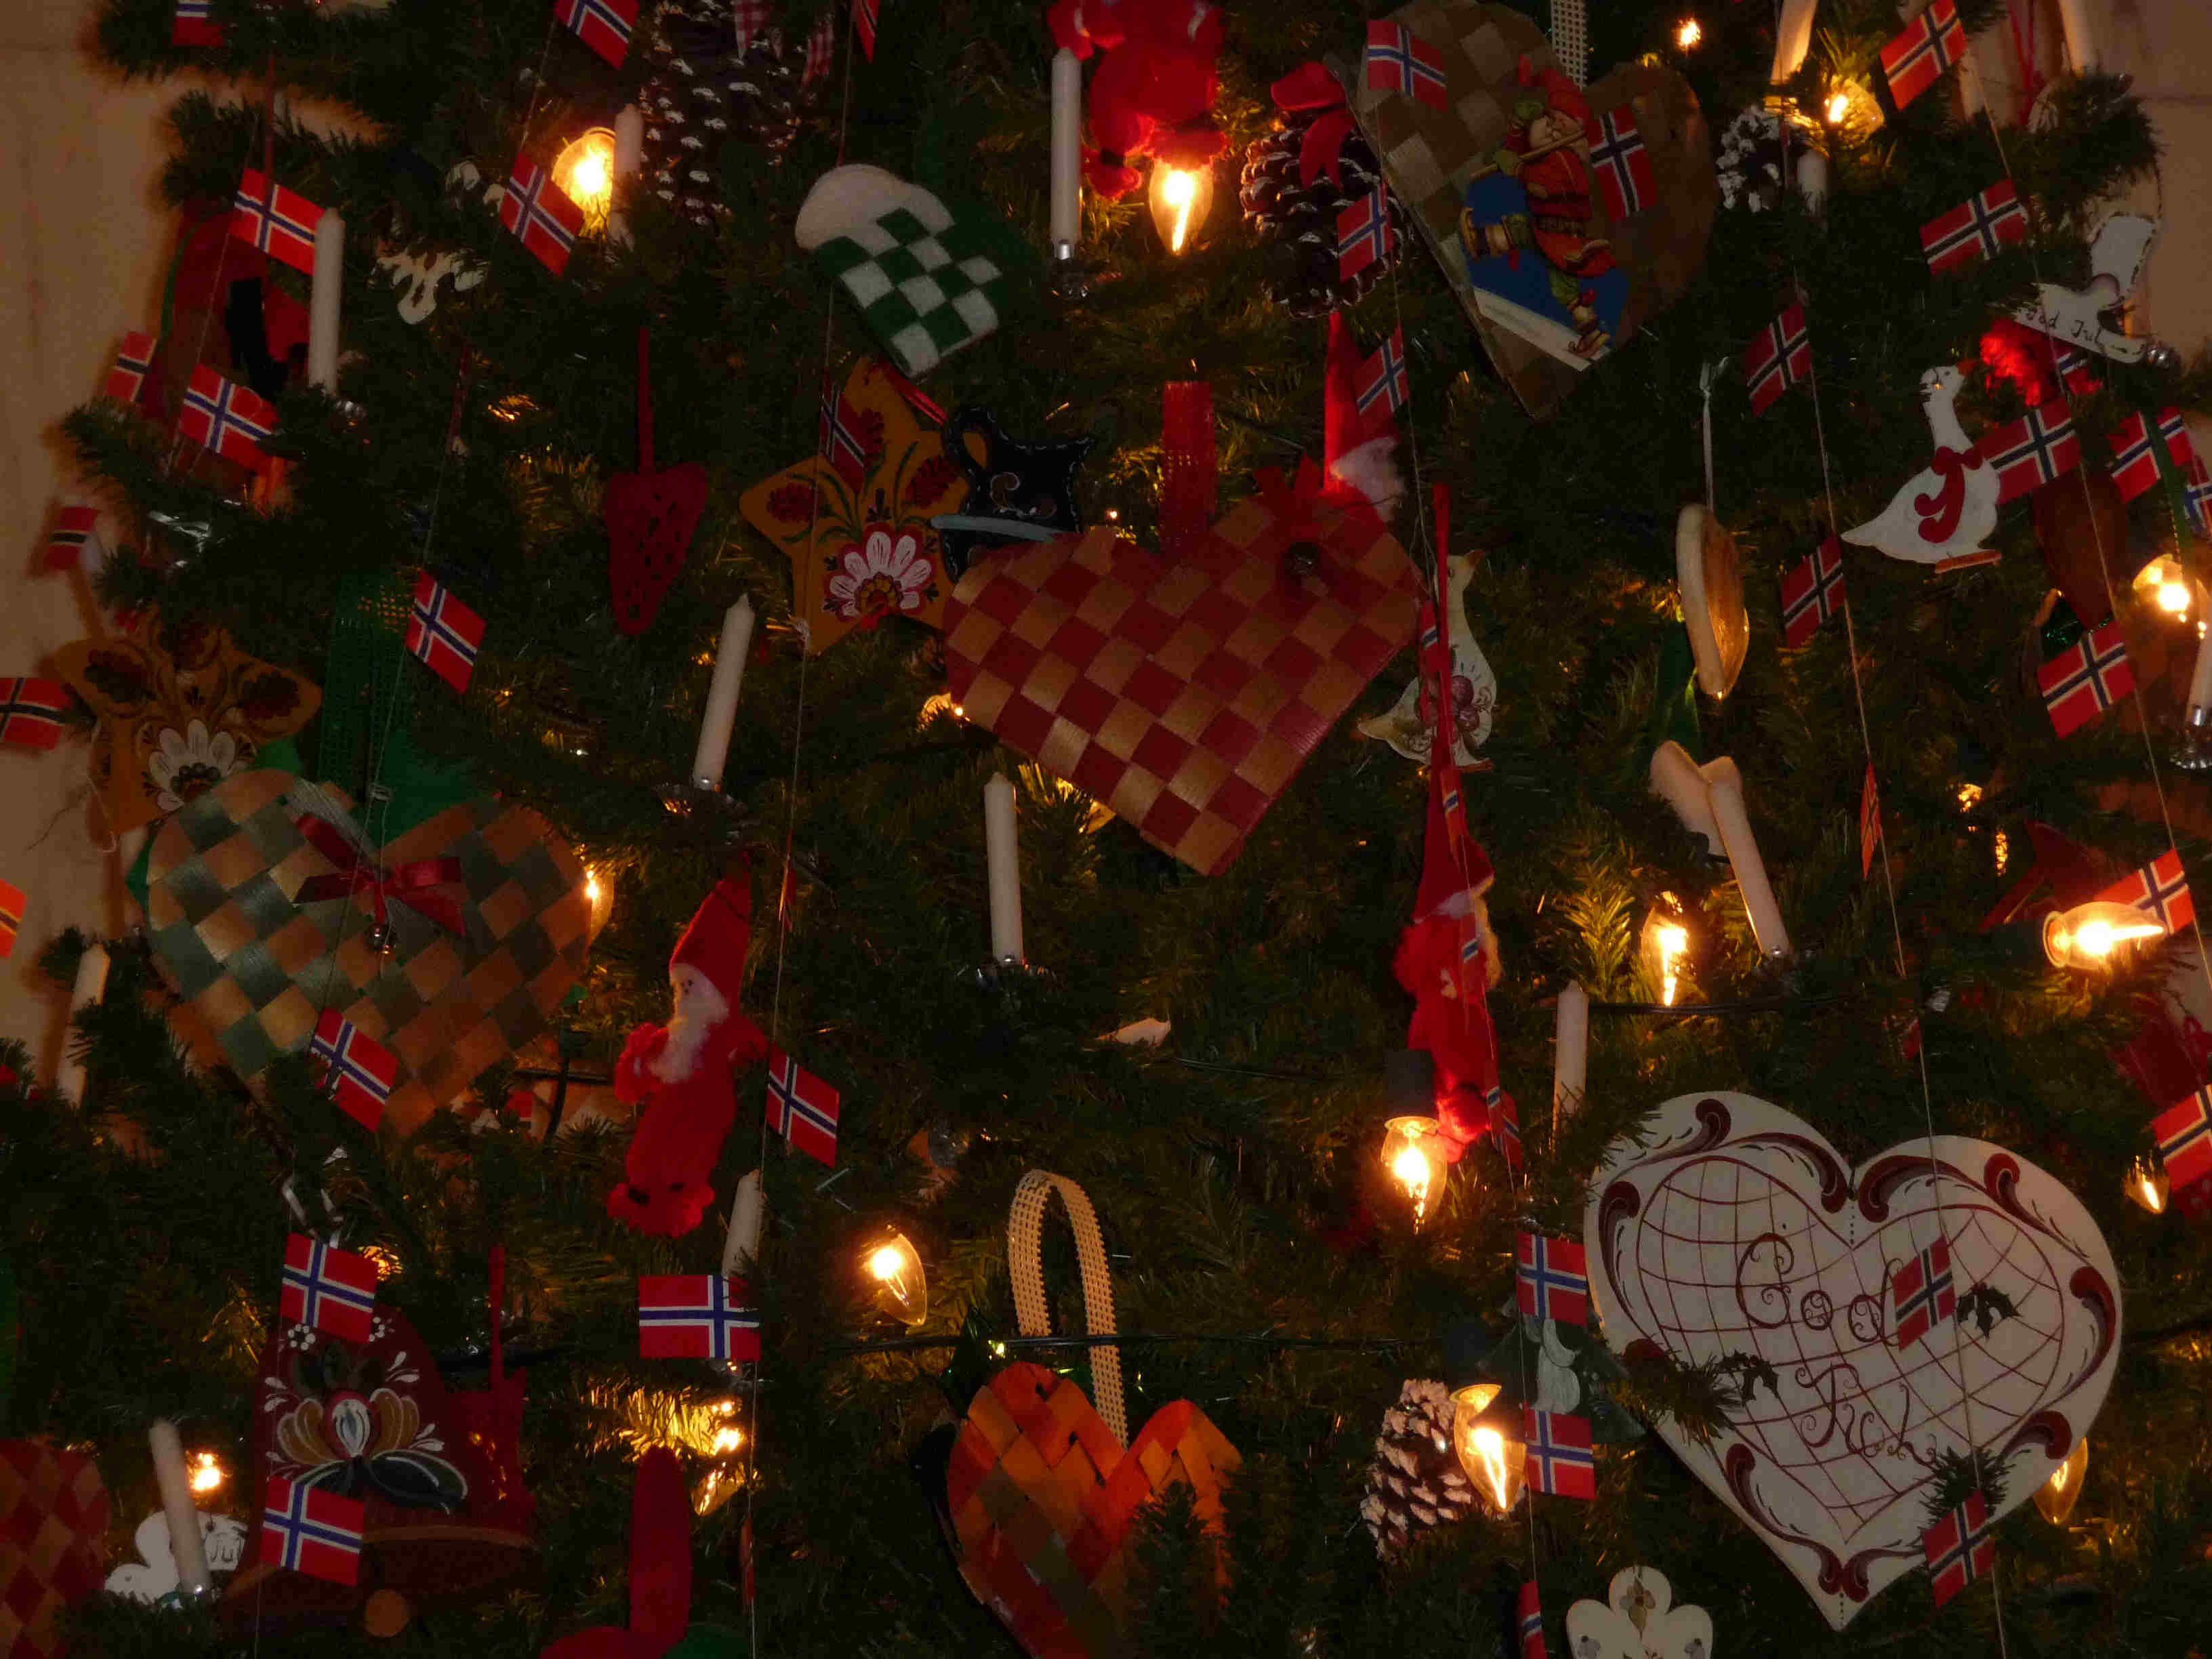 Norwegian Christmas At The Msi Norsk Folk Art And Customs